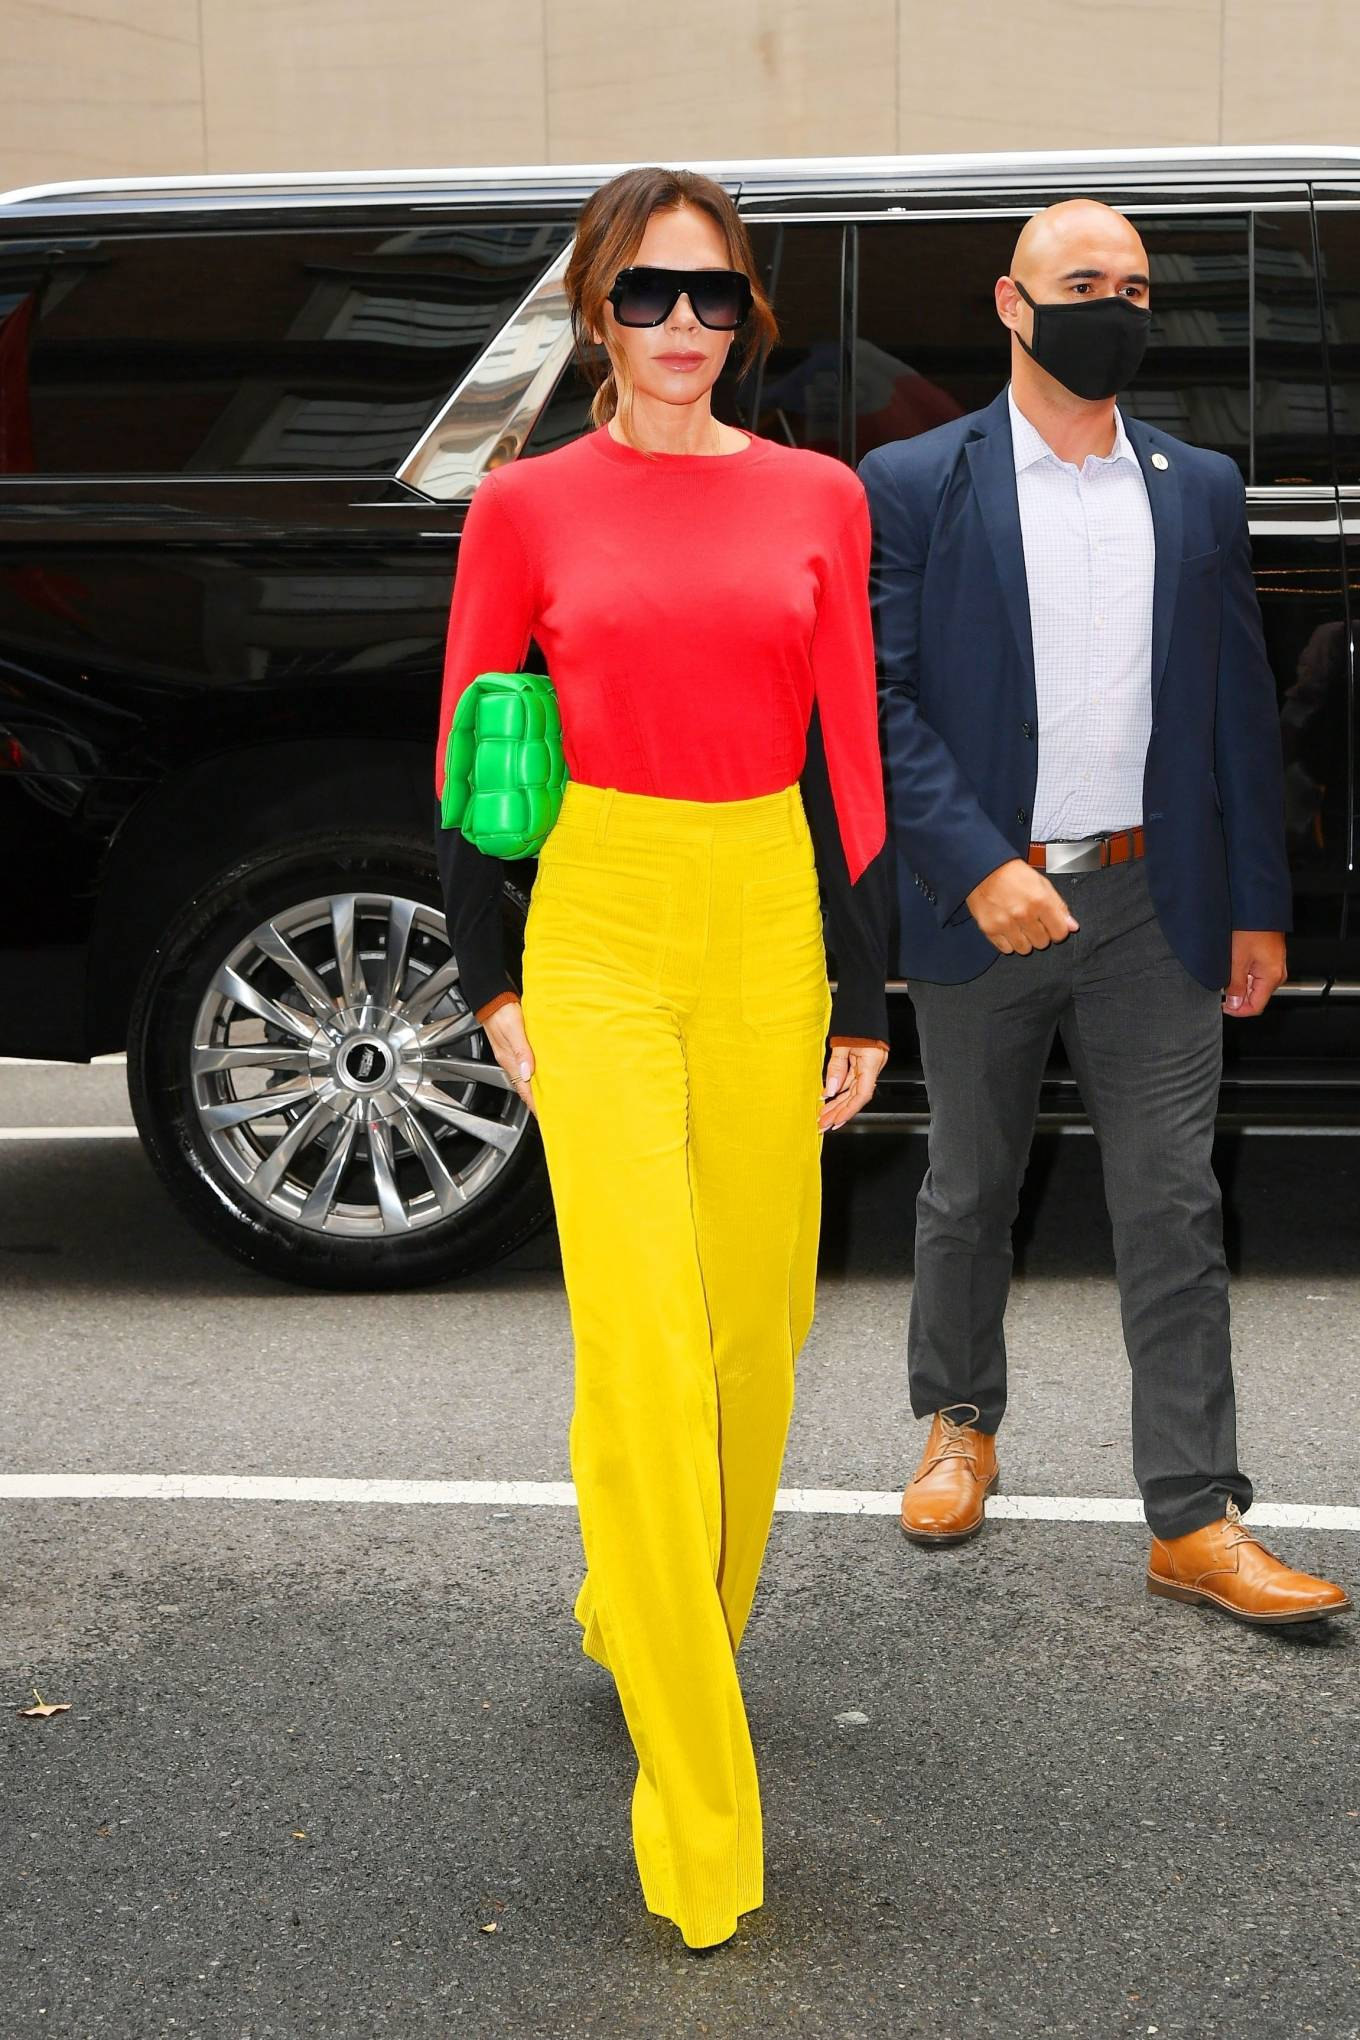 Victoria Beckham 2021 : Victoria Beckham – on Good Morning America promoting her new designer clothing in New York City-23